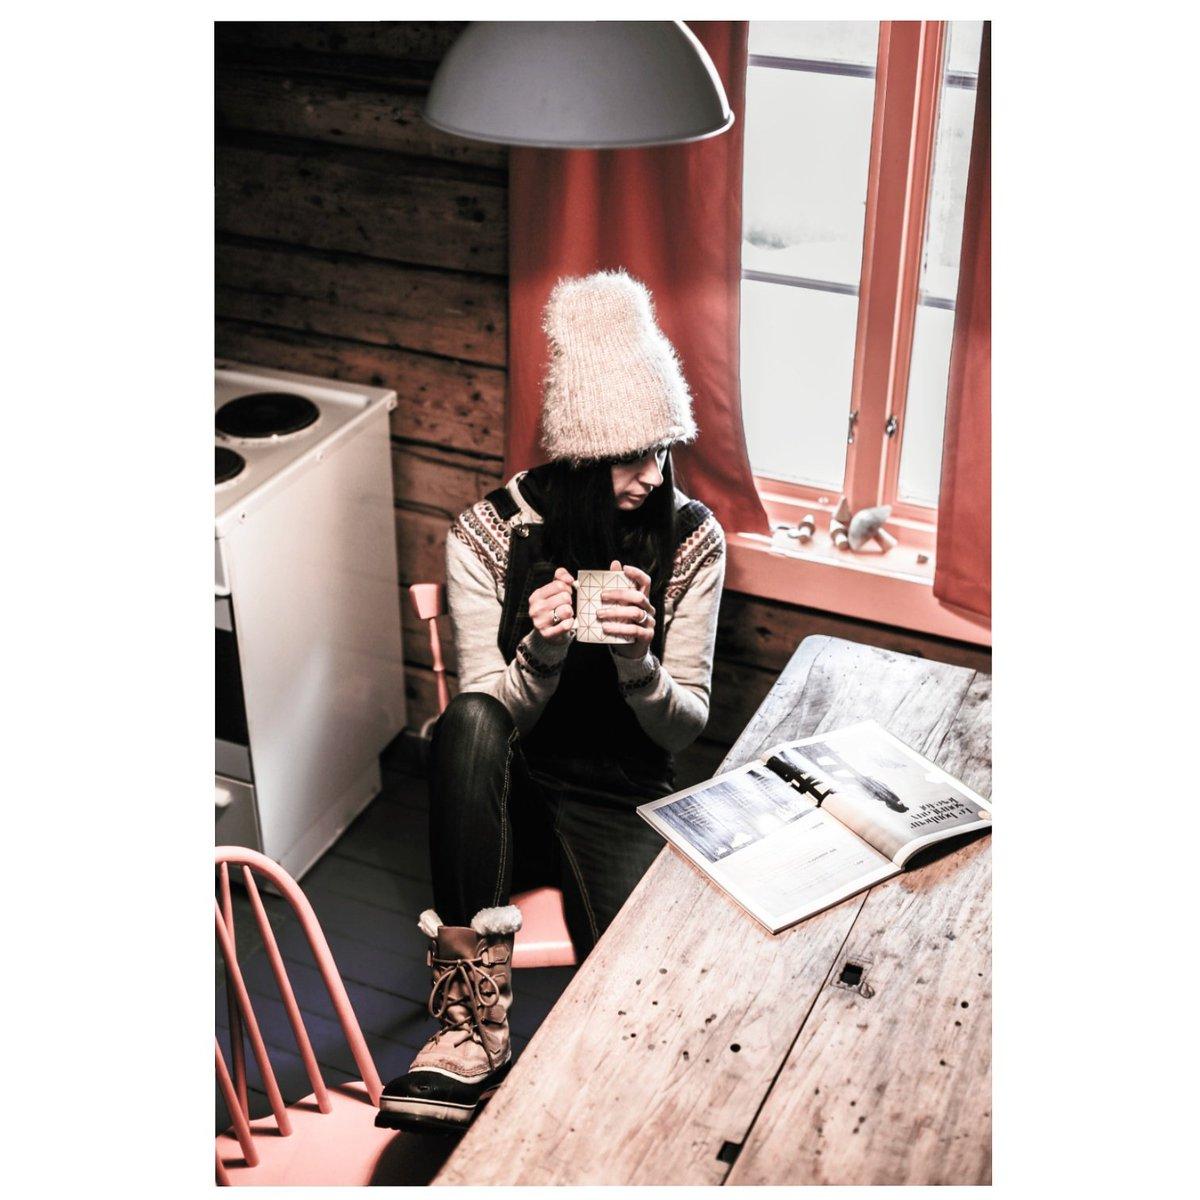 C&#39;est encore l&#39;hiver sur le blog avec mon Loobook spécial Norway     http://www. littlebirdyworld.com/lookbook-norve ge &nbsp; …  #lookbook #ootd #mode #winter #blog #fashion<br>http://pic.twitter.com/hZjOg160Ye